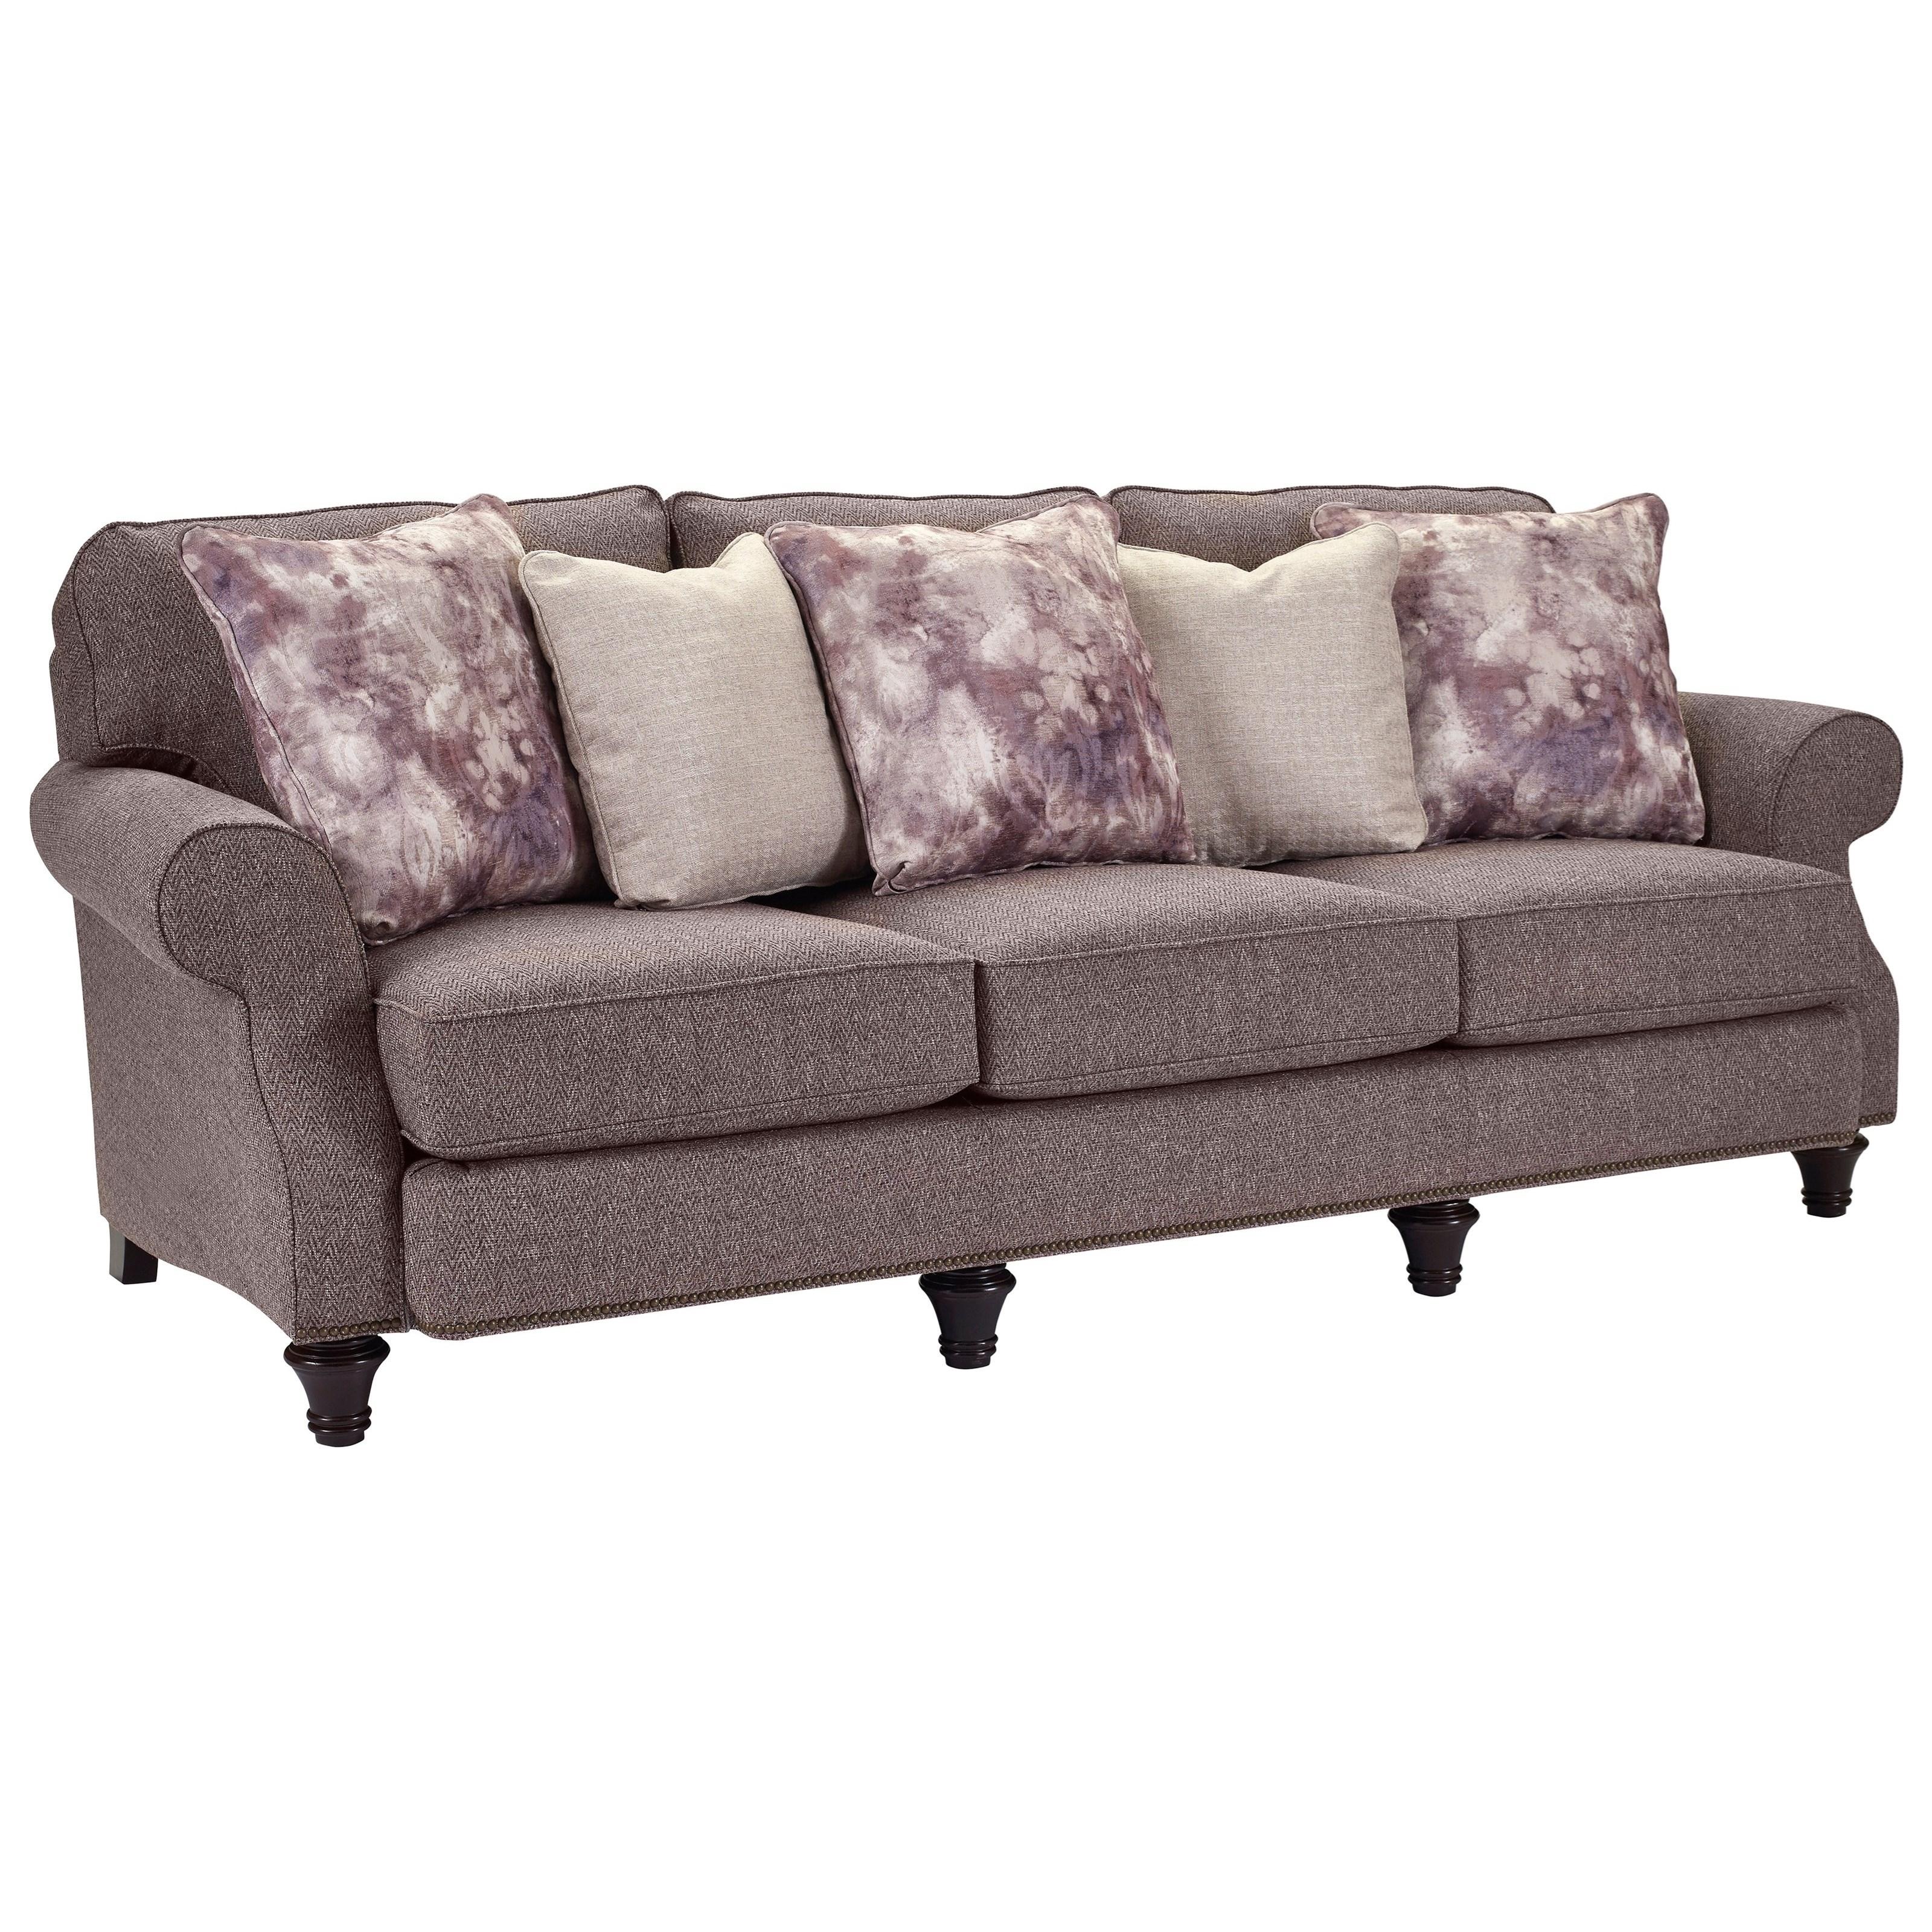 Broyhill Furniture WhitfieldSofa